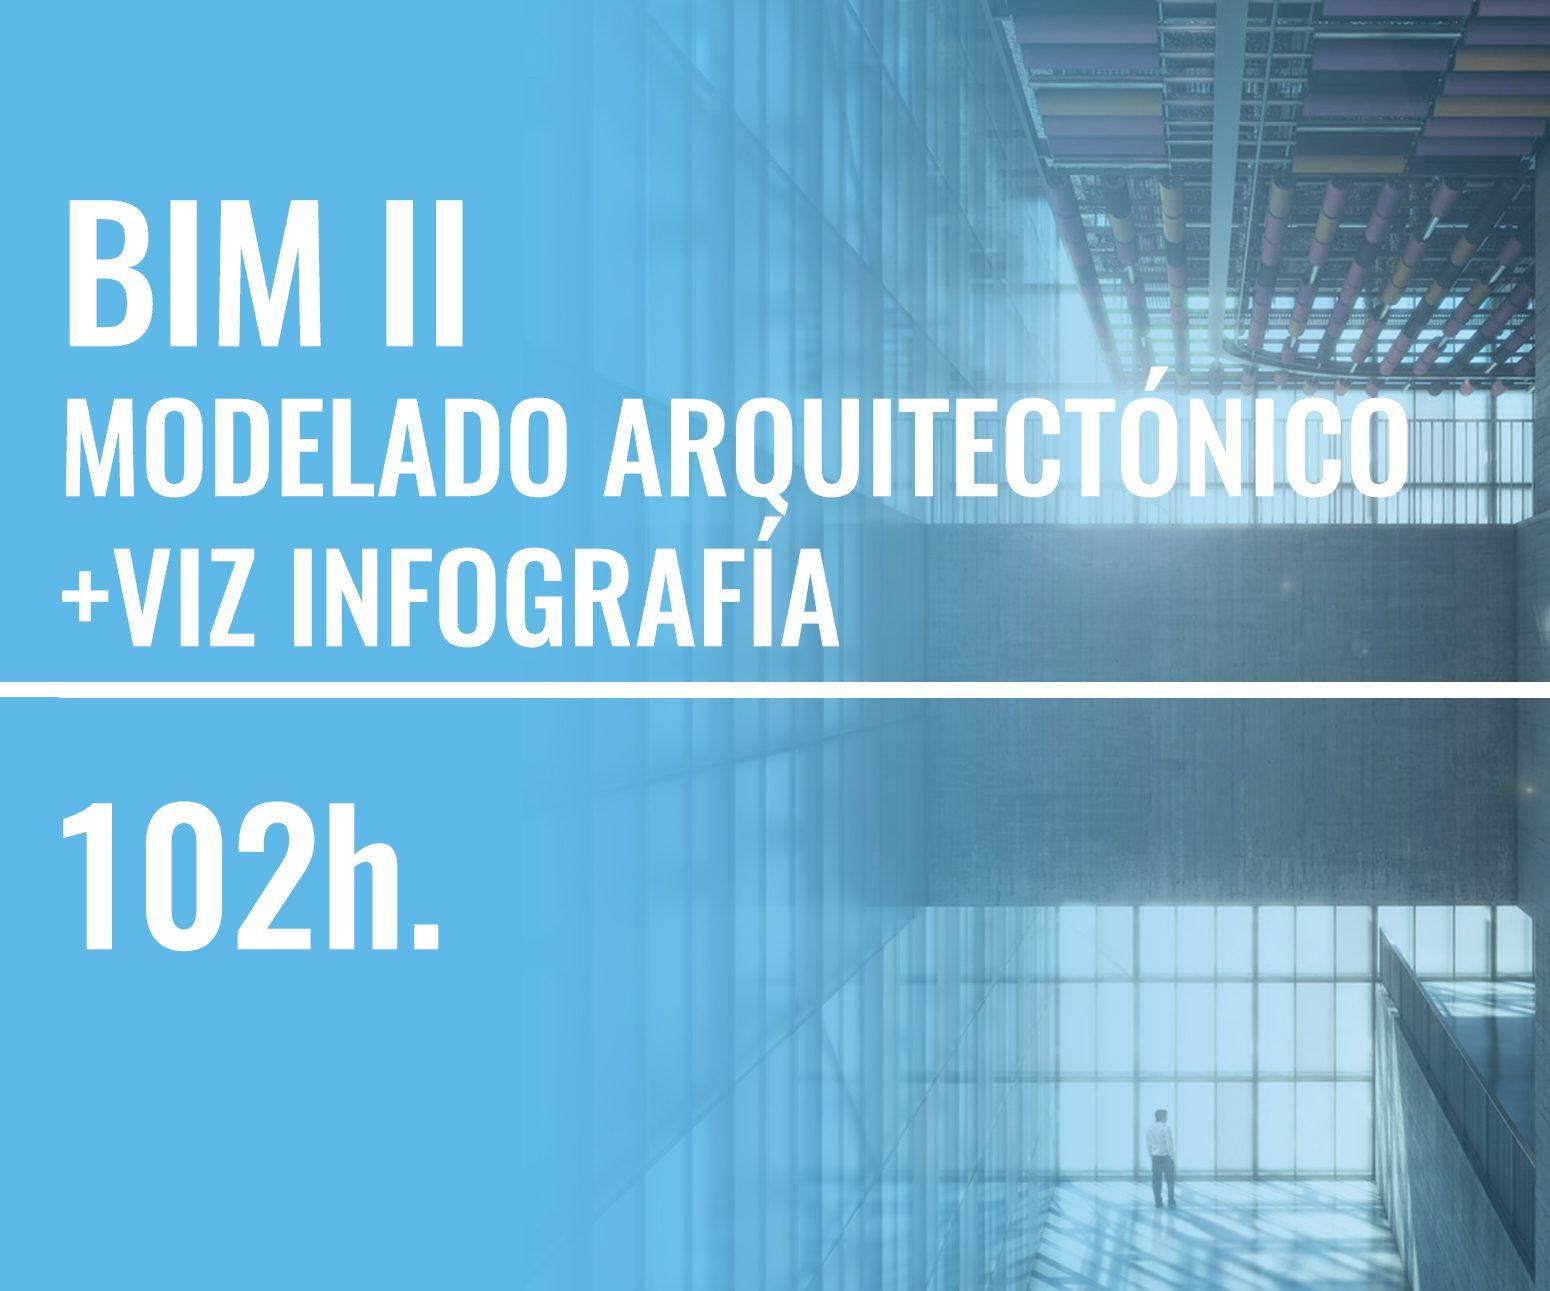 BIM II: Modelado Arquitectónico + VIZ Infografía Oficial Autodesk